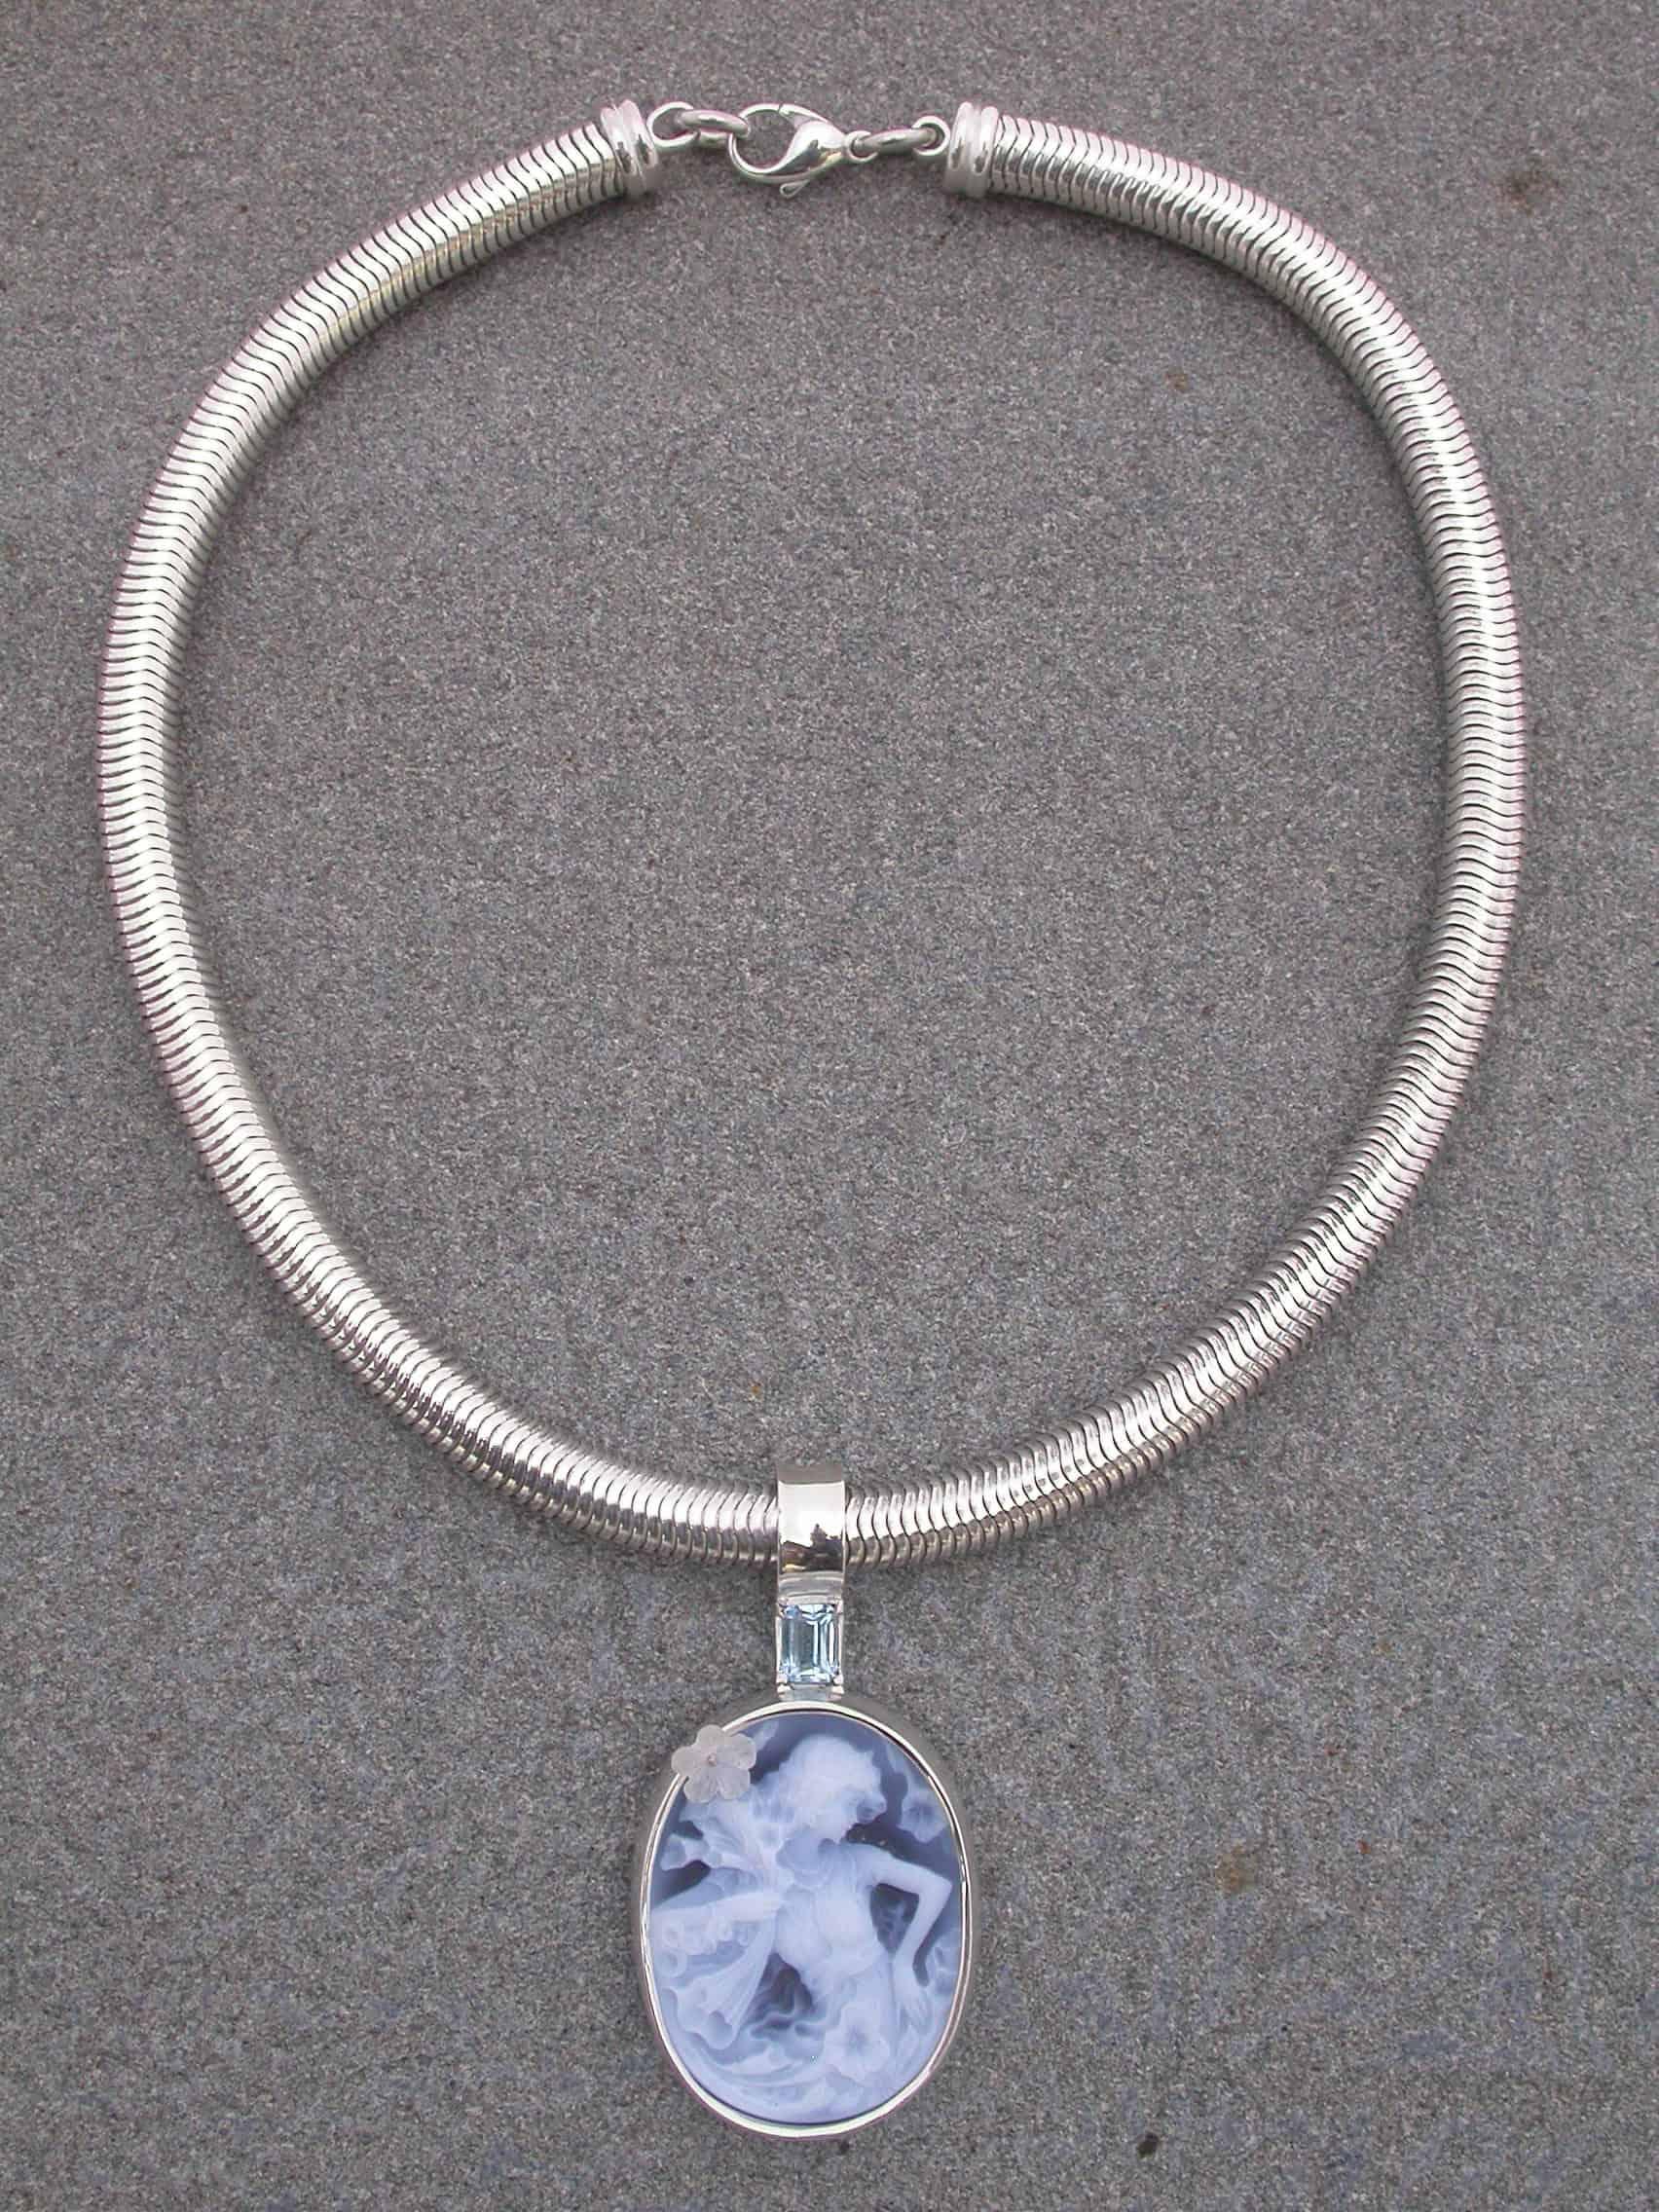 Unique necklaces, onyx, aquamarine, sterling silver